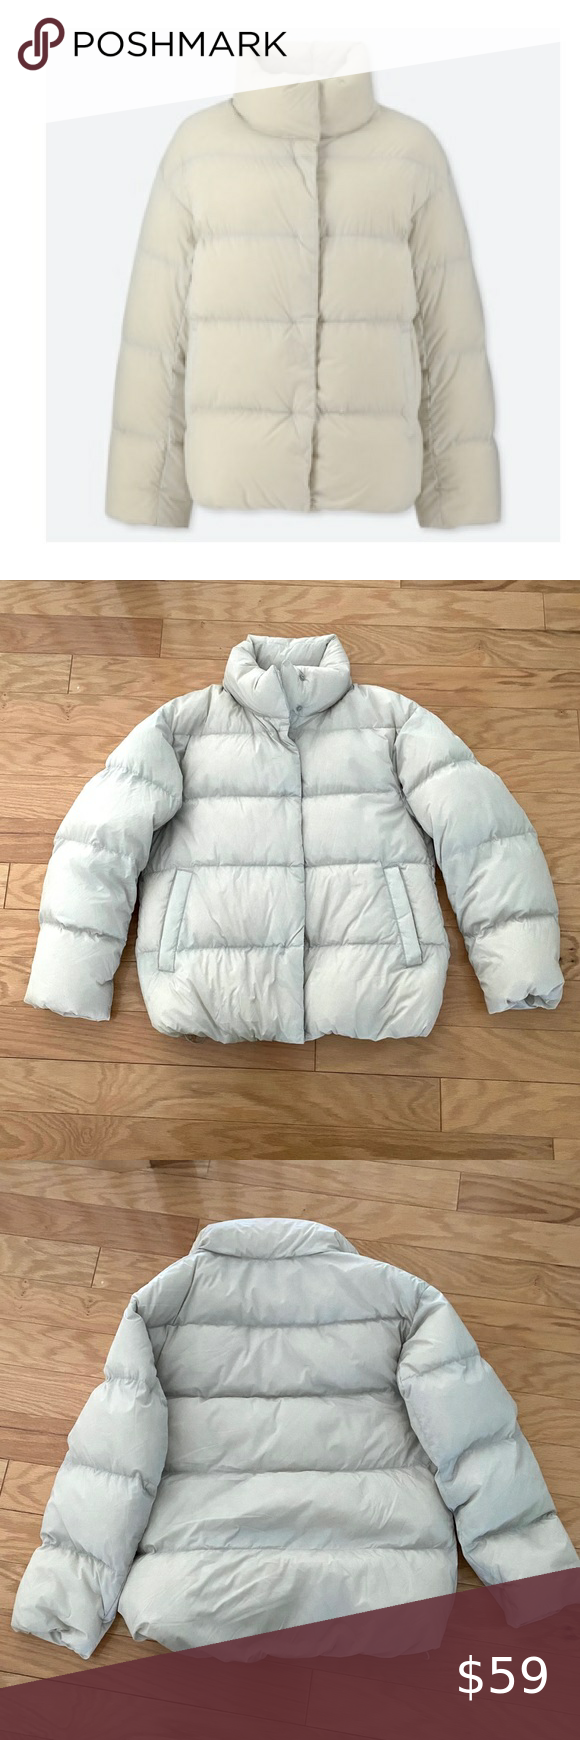 New Uniqlo Ultra Light Down Light Gray Puffer Coat In 2021 Grey Puffer Coat Puffer Coat Pink Puffer Coat [ 1740 x 580 Pixel ]